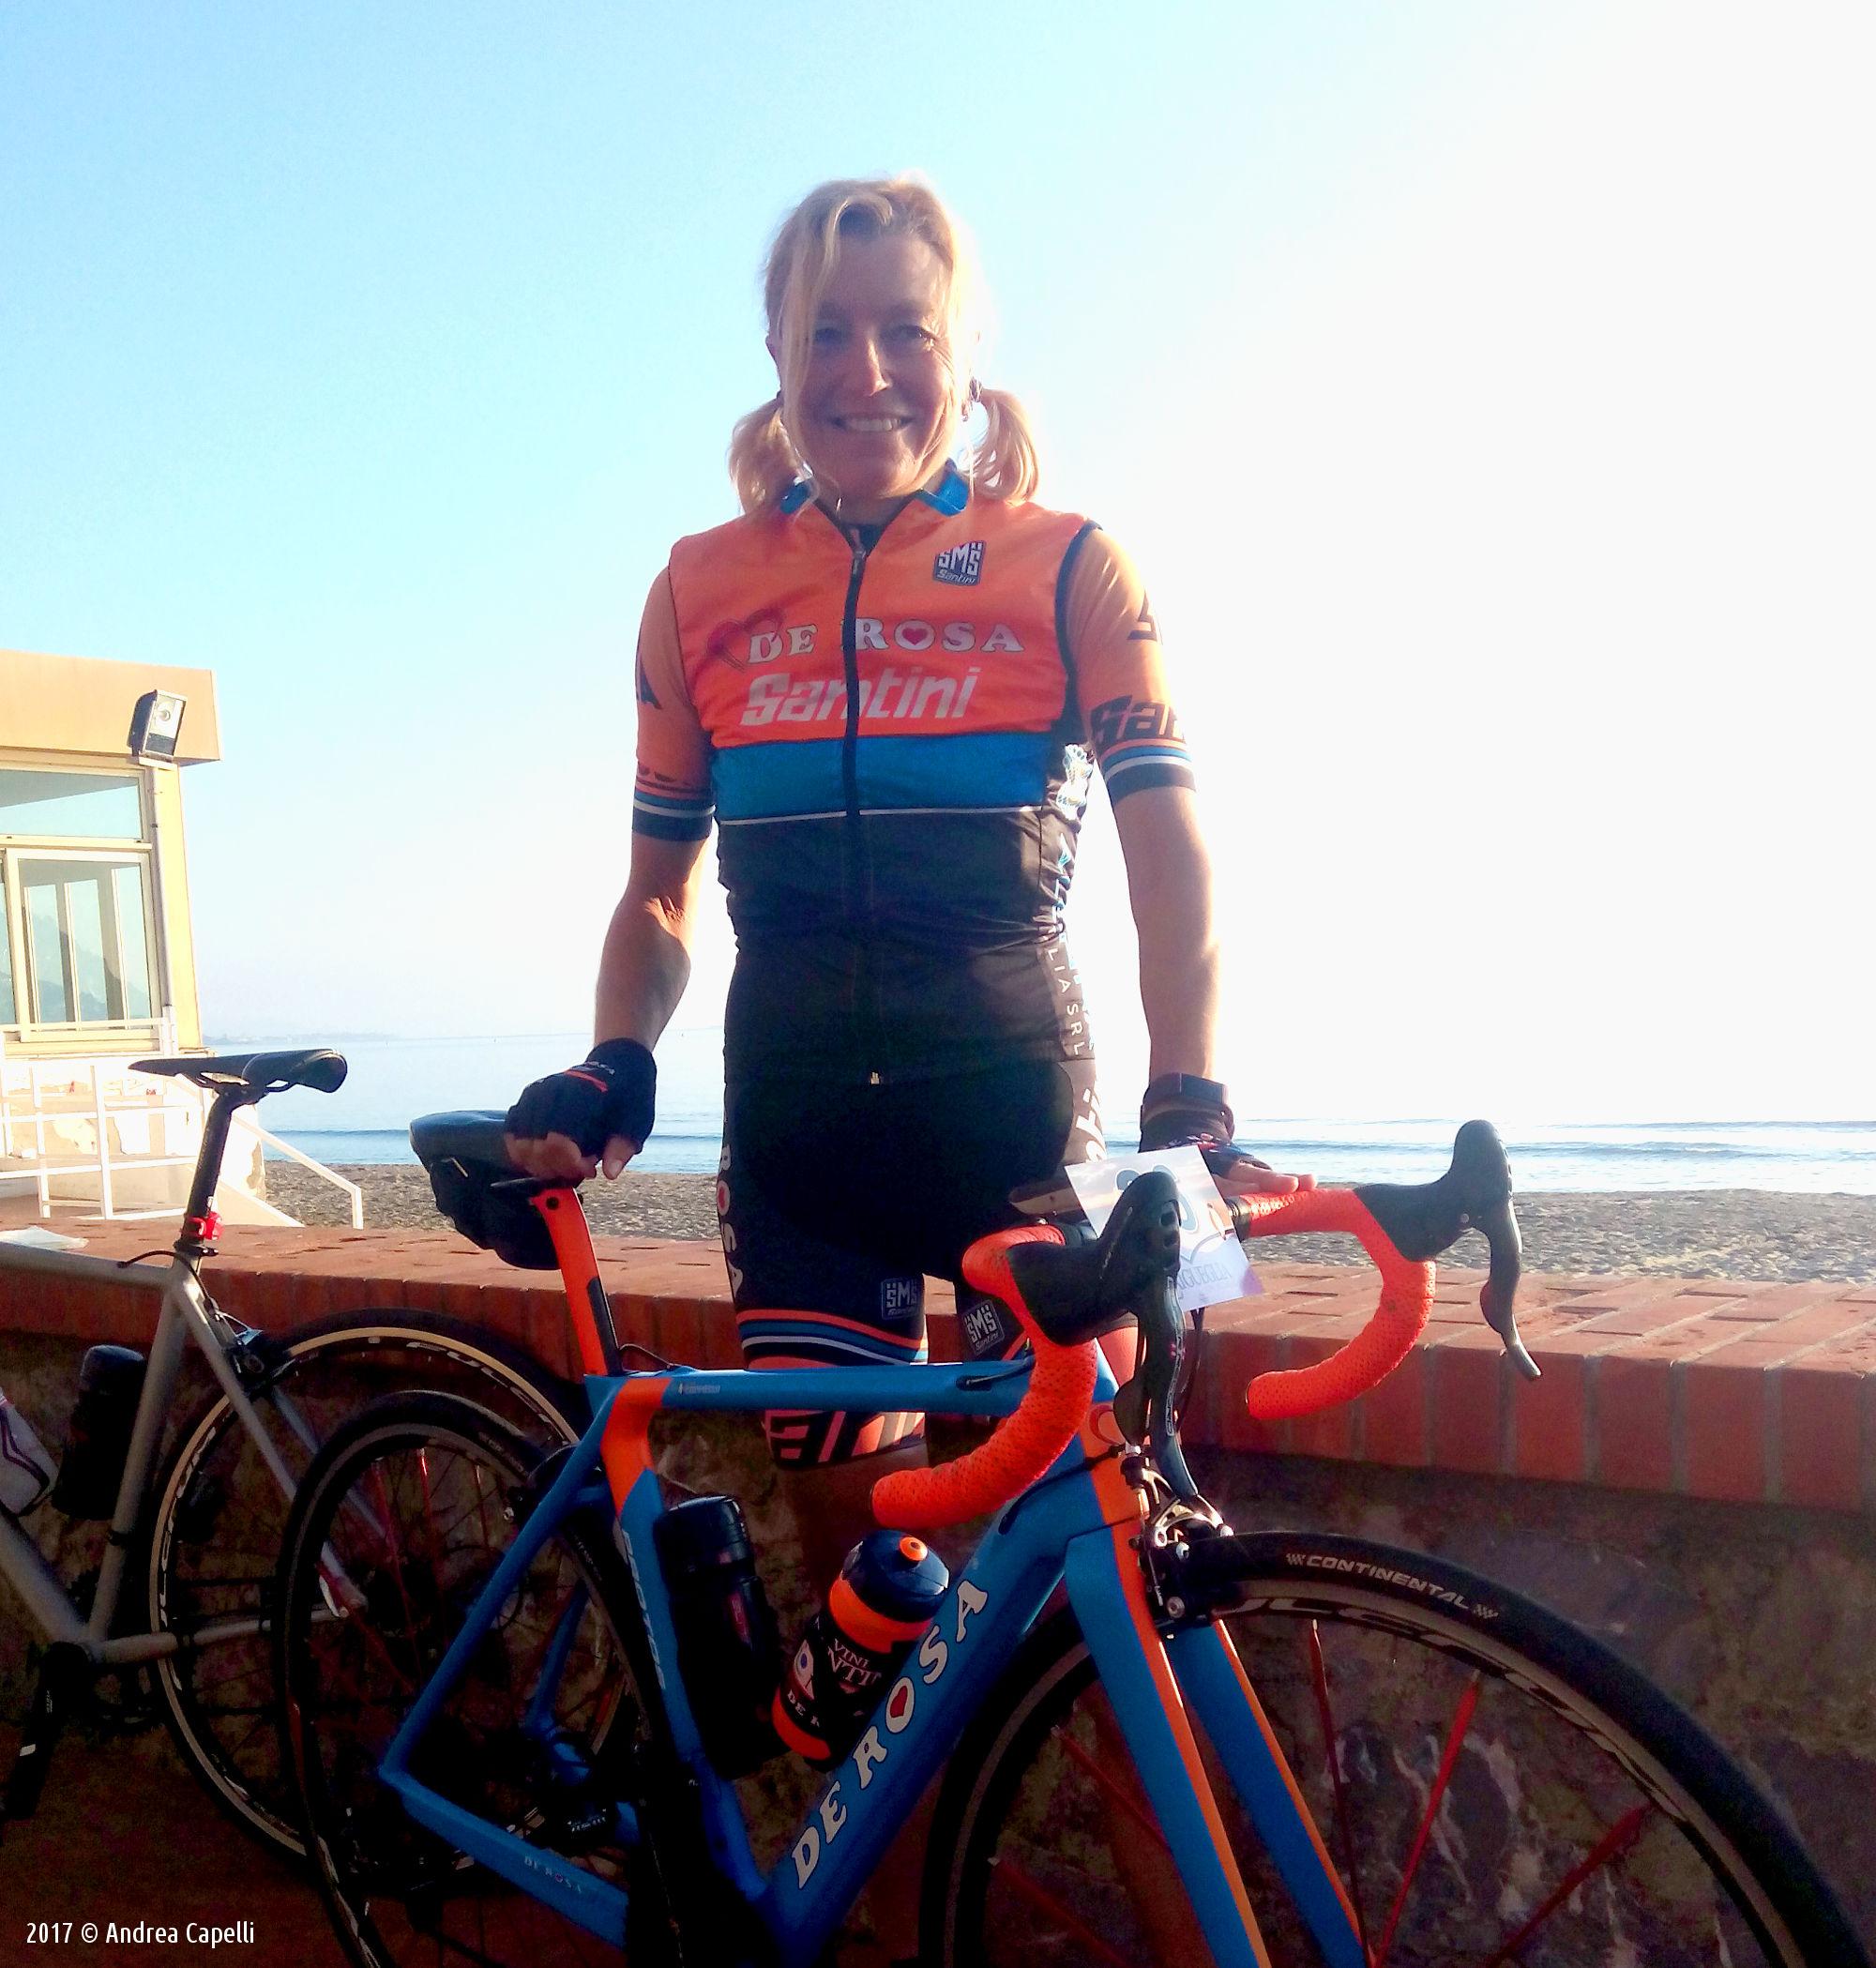 Olga Cappiello Laigueglia Rosa - Team De Rosa Santini